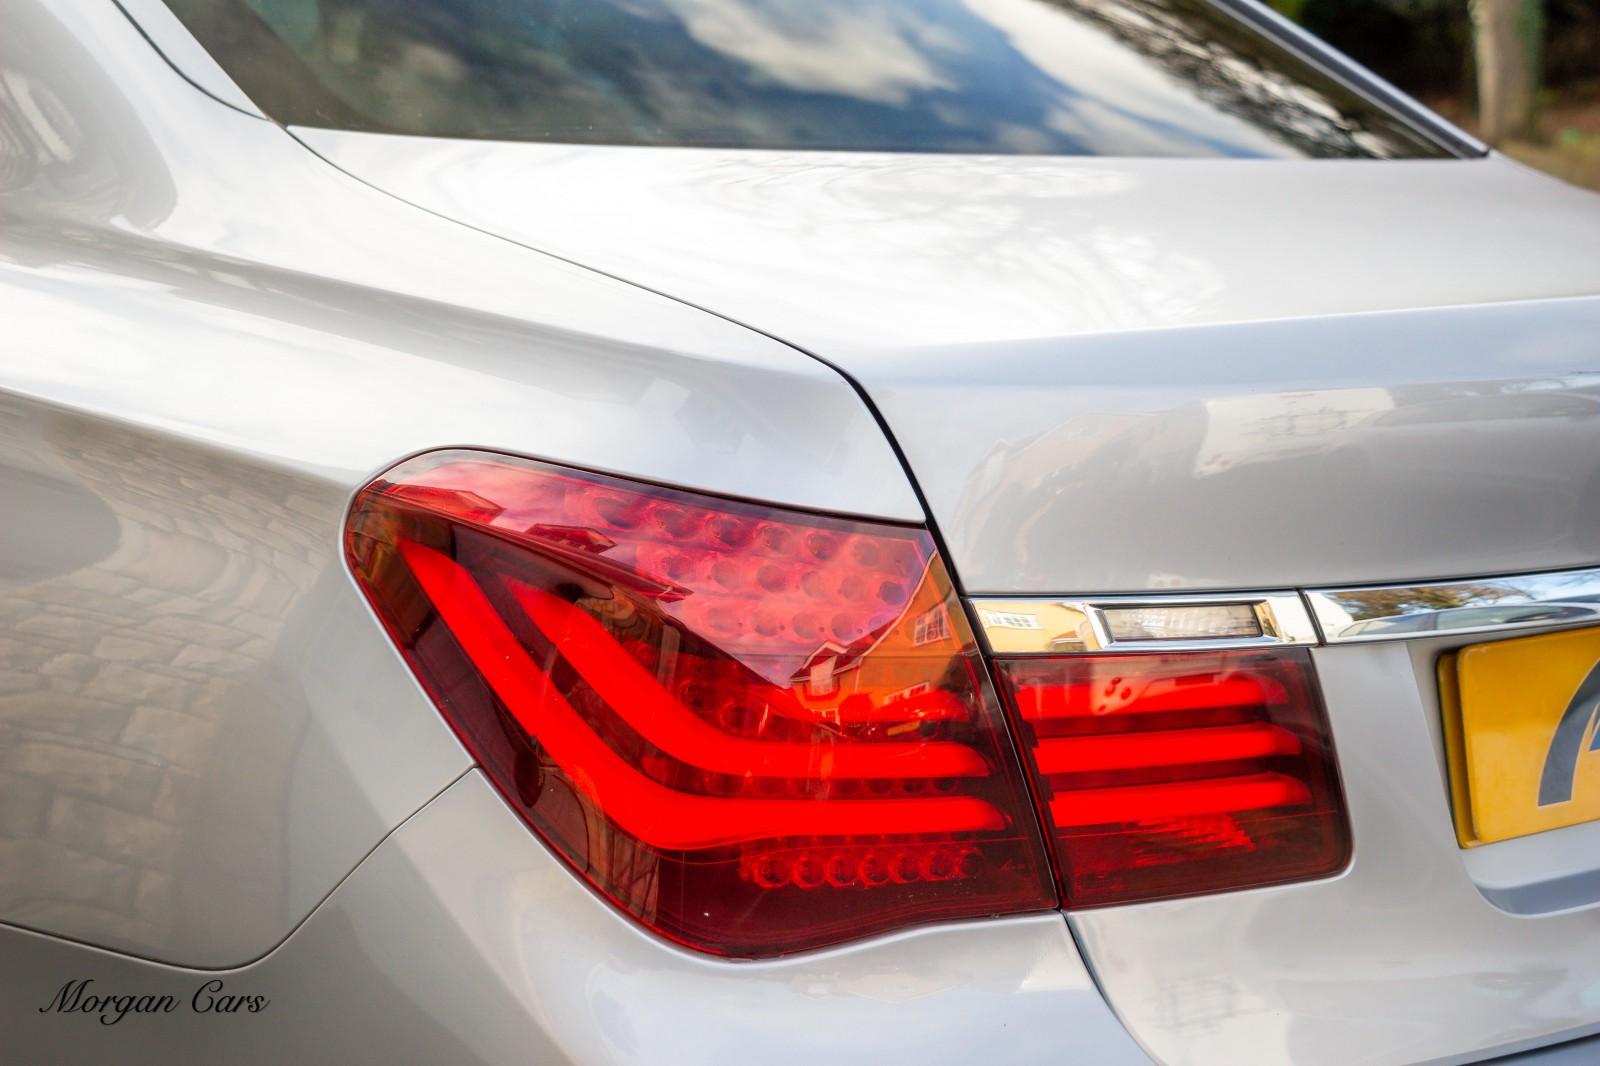 2014 BMW 7 Series 730D M SPORT Diesel Automatic – Morgan Cars 9 Mound Road, Warrenpoint, Newry BT34 3LW, UK full